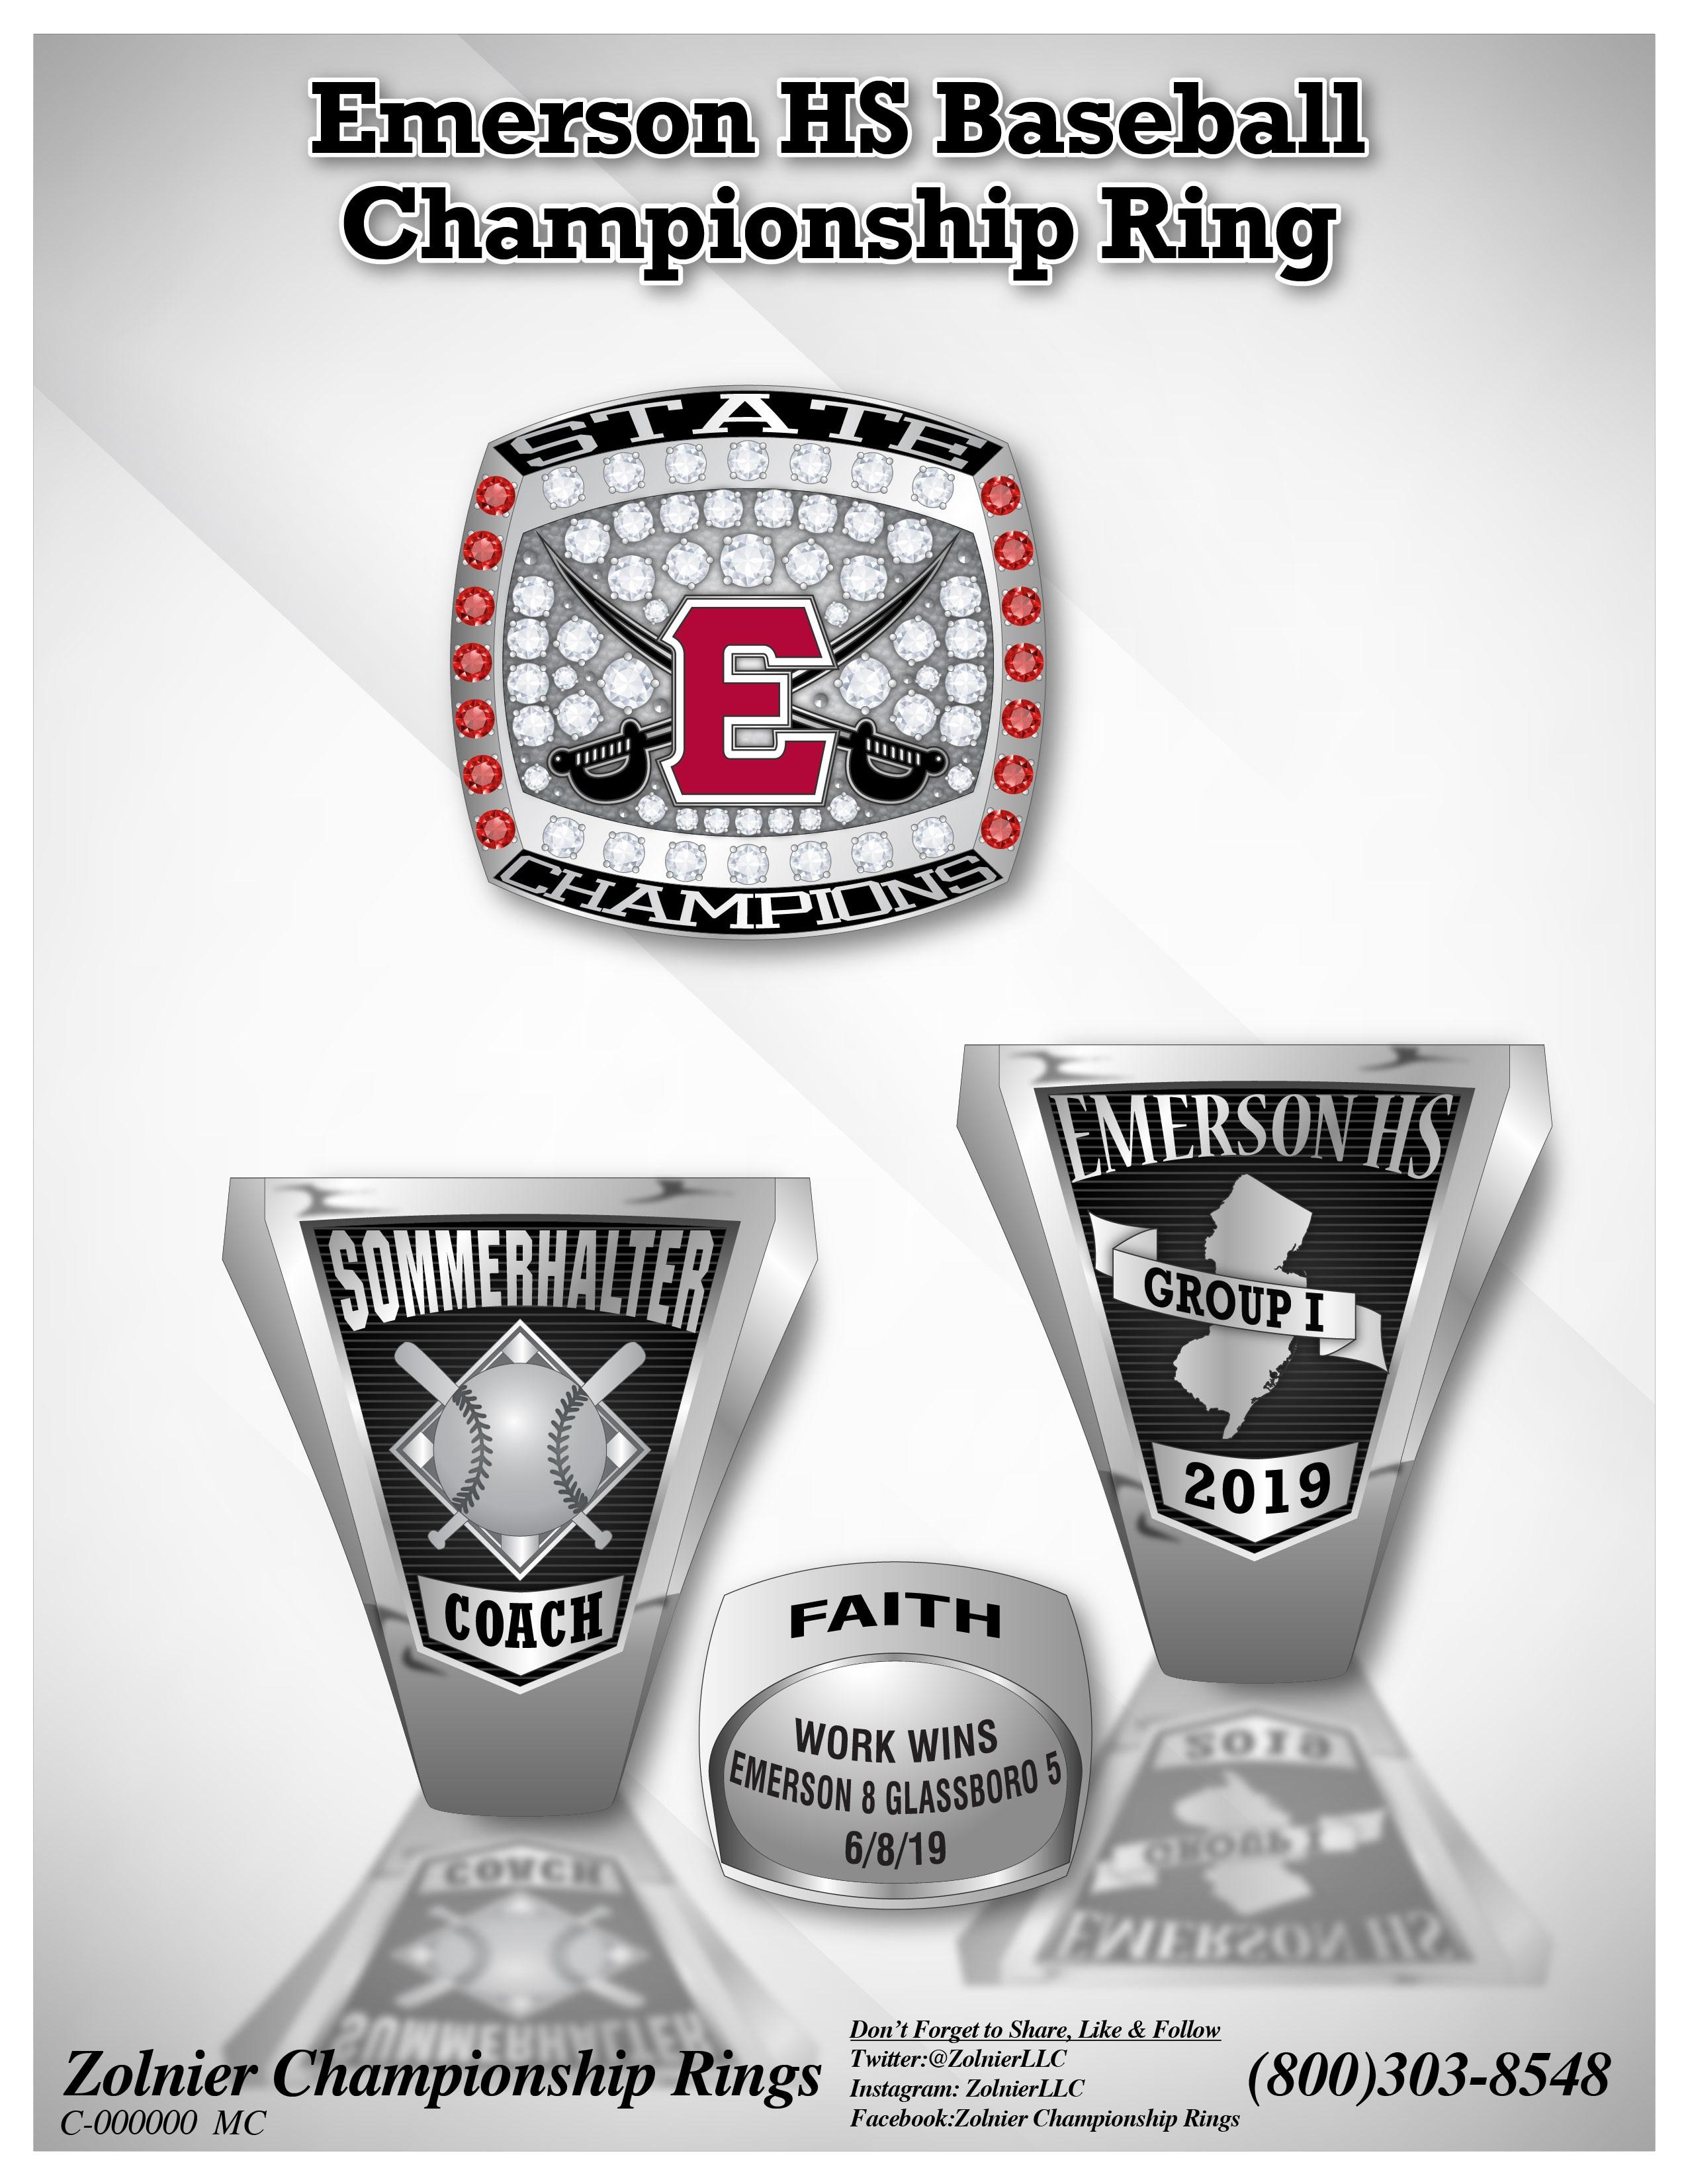 C-164193 Emerson HS Baseball Champ Ring